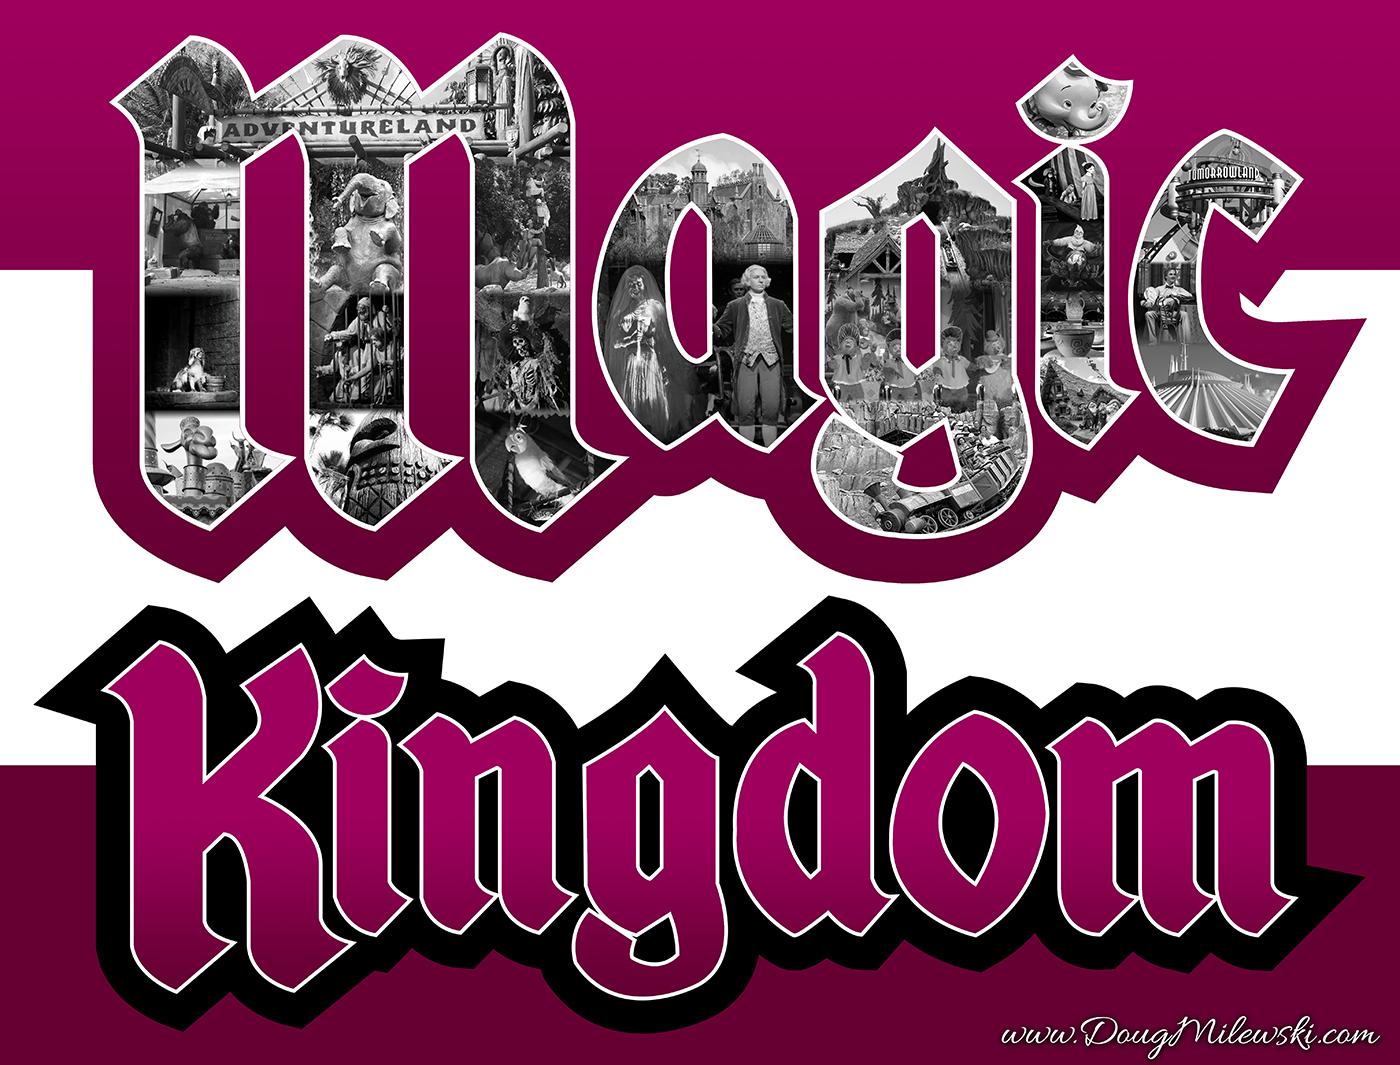 Magic kingdom disney world clipart svg transparent library Magic Kingdom Logo   WDWMAGIC - Unofficial Walt Disney World ... svg transparent library